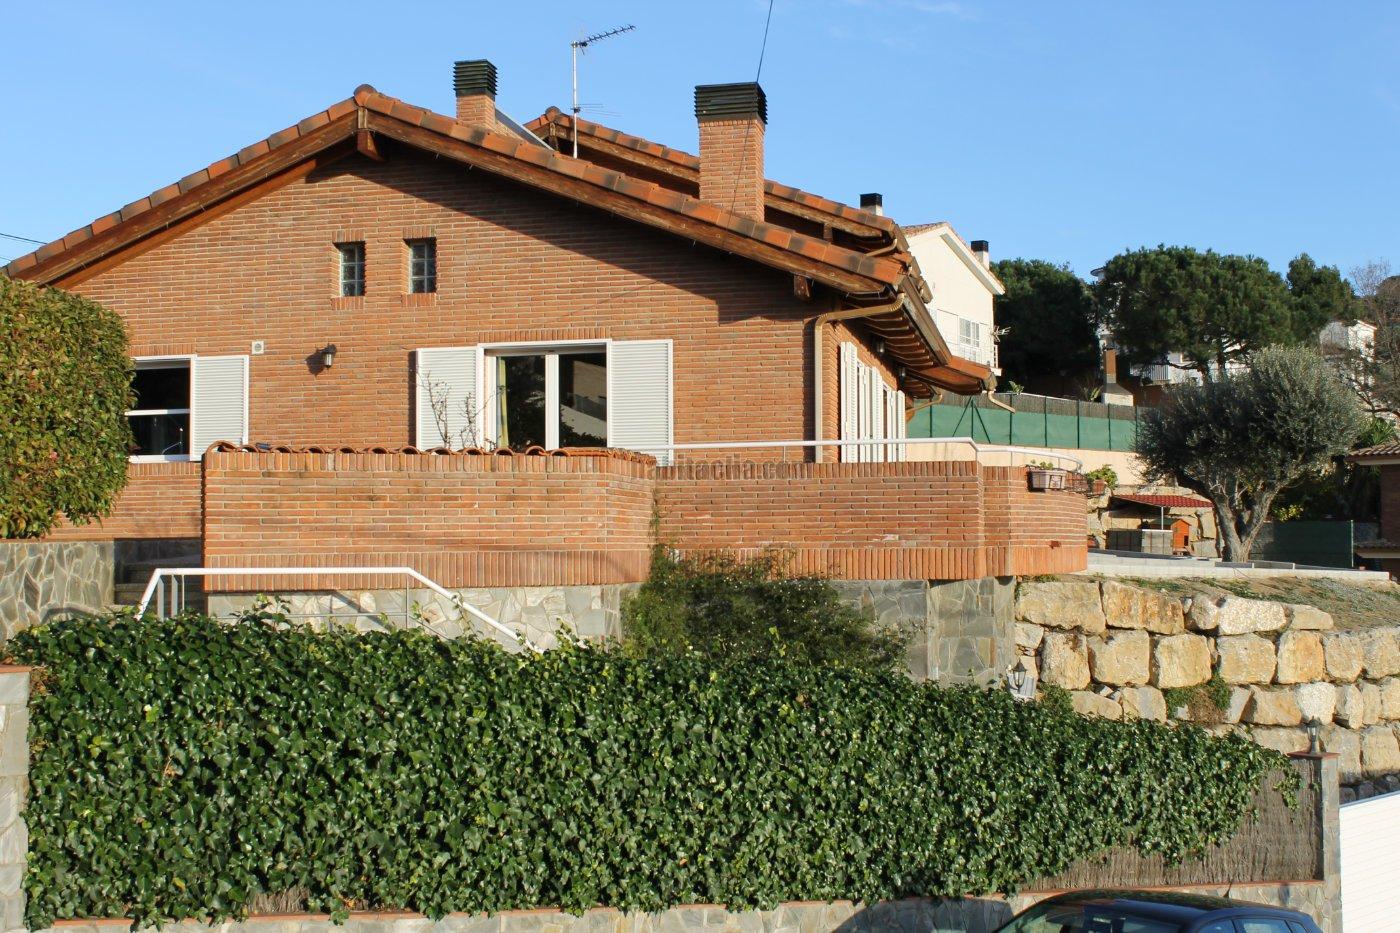 Casa por en carrer sant lloren en sant fost de - Casas en venta en sant fost de campsentelles ...